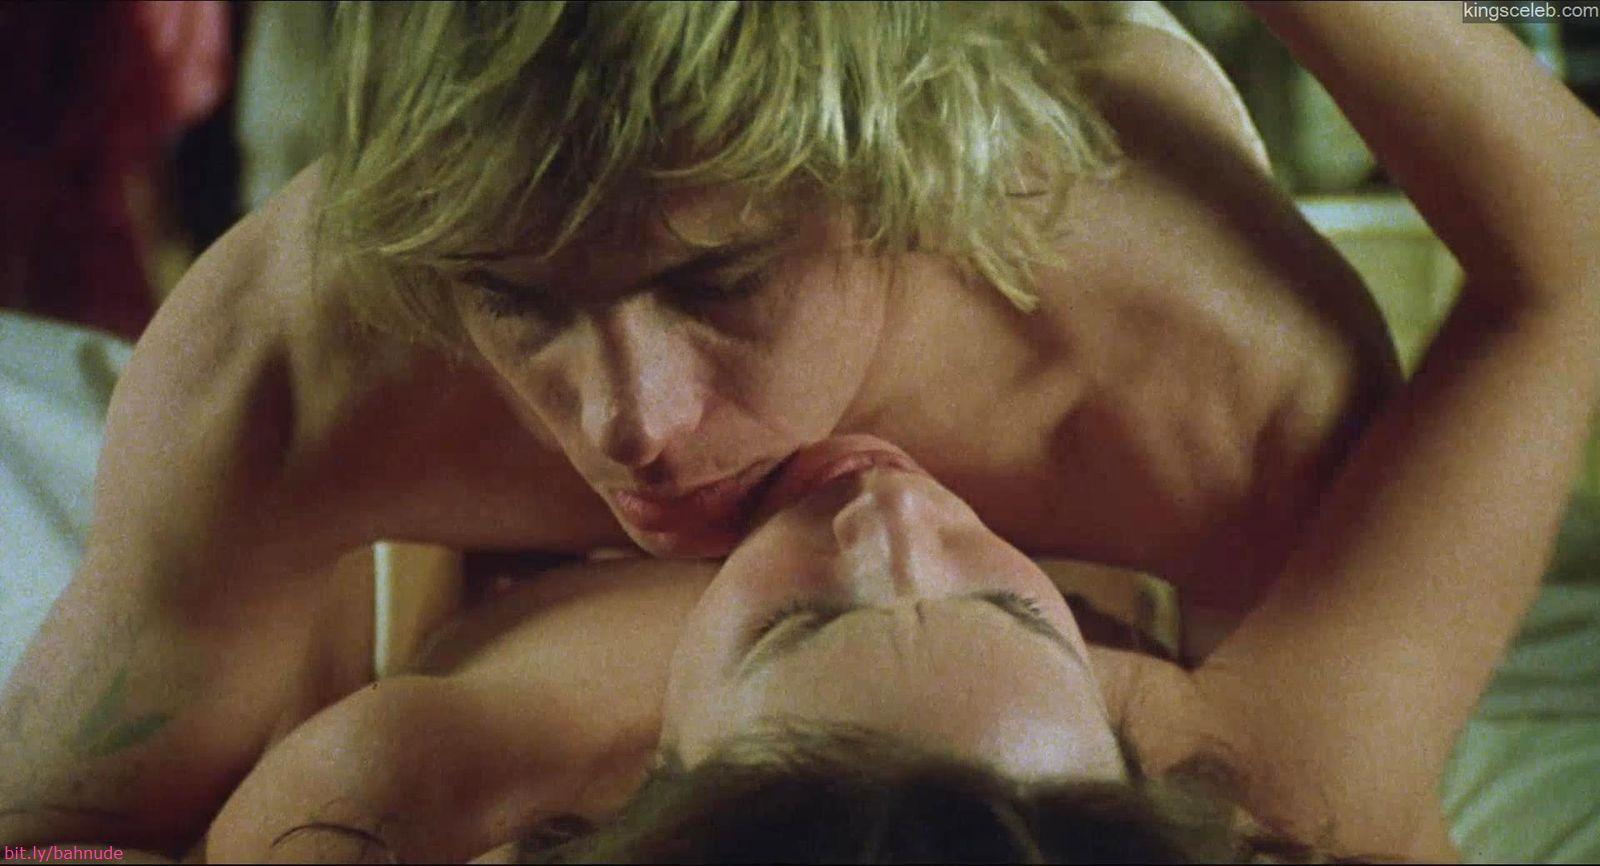 Barbara hershey nude that interrupt